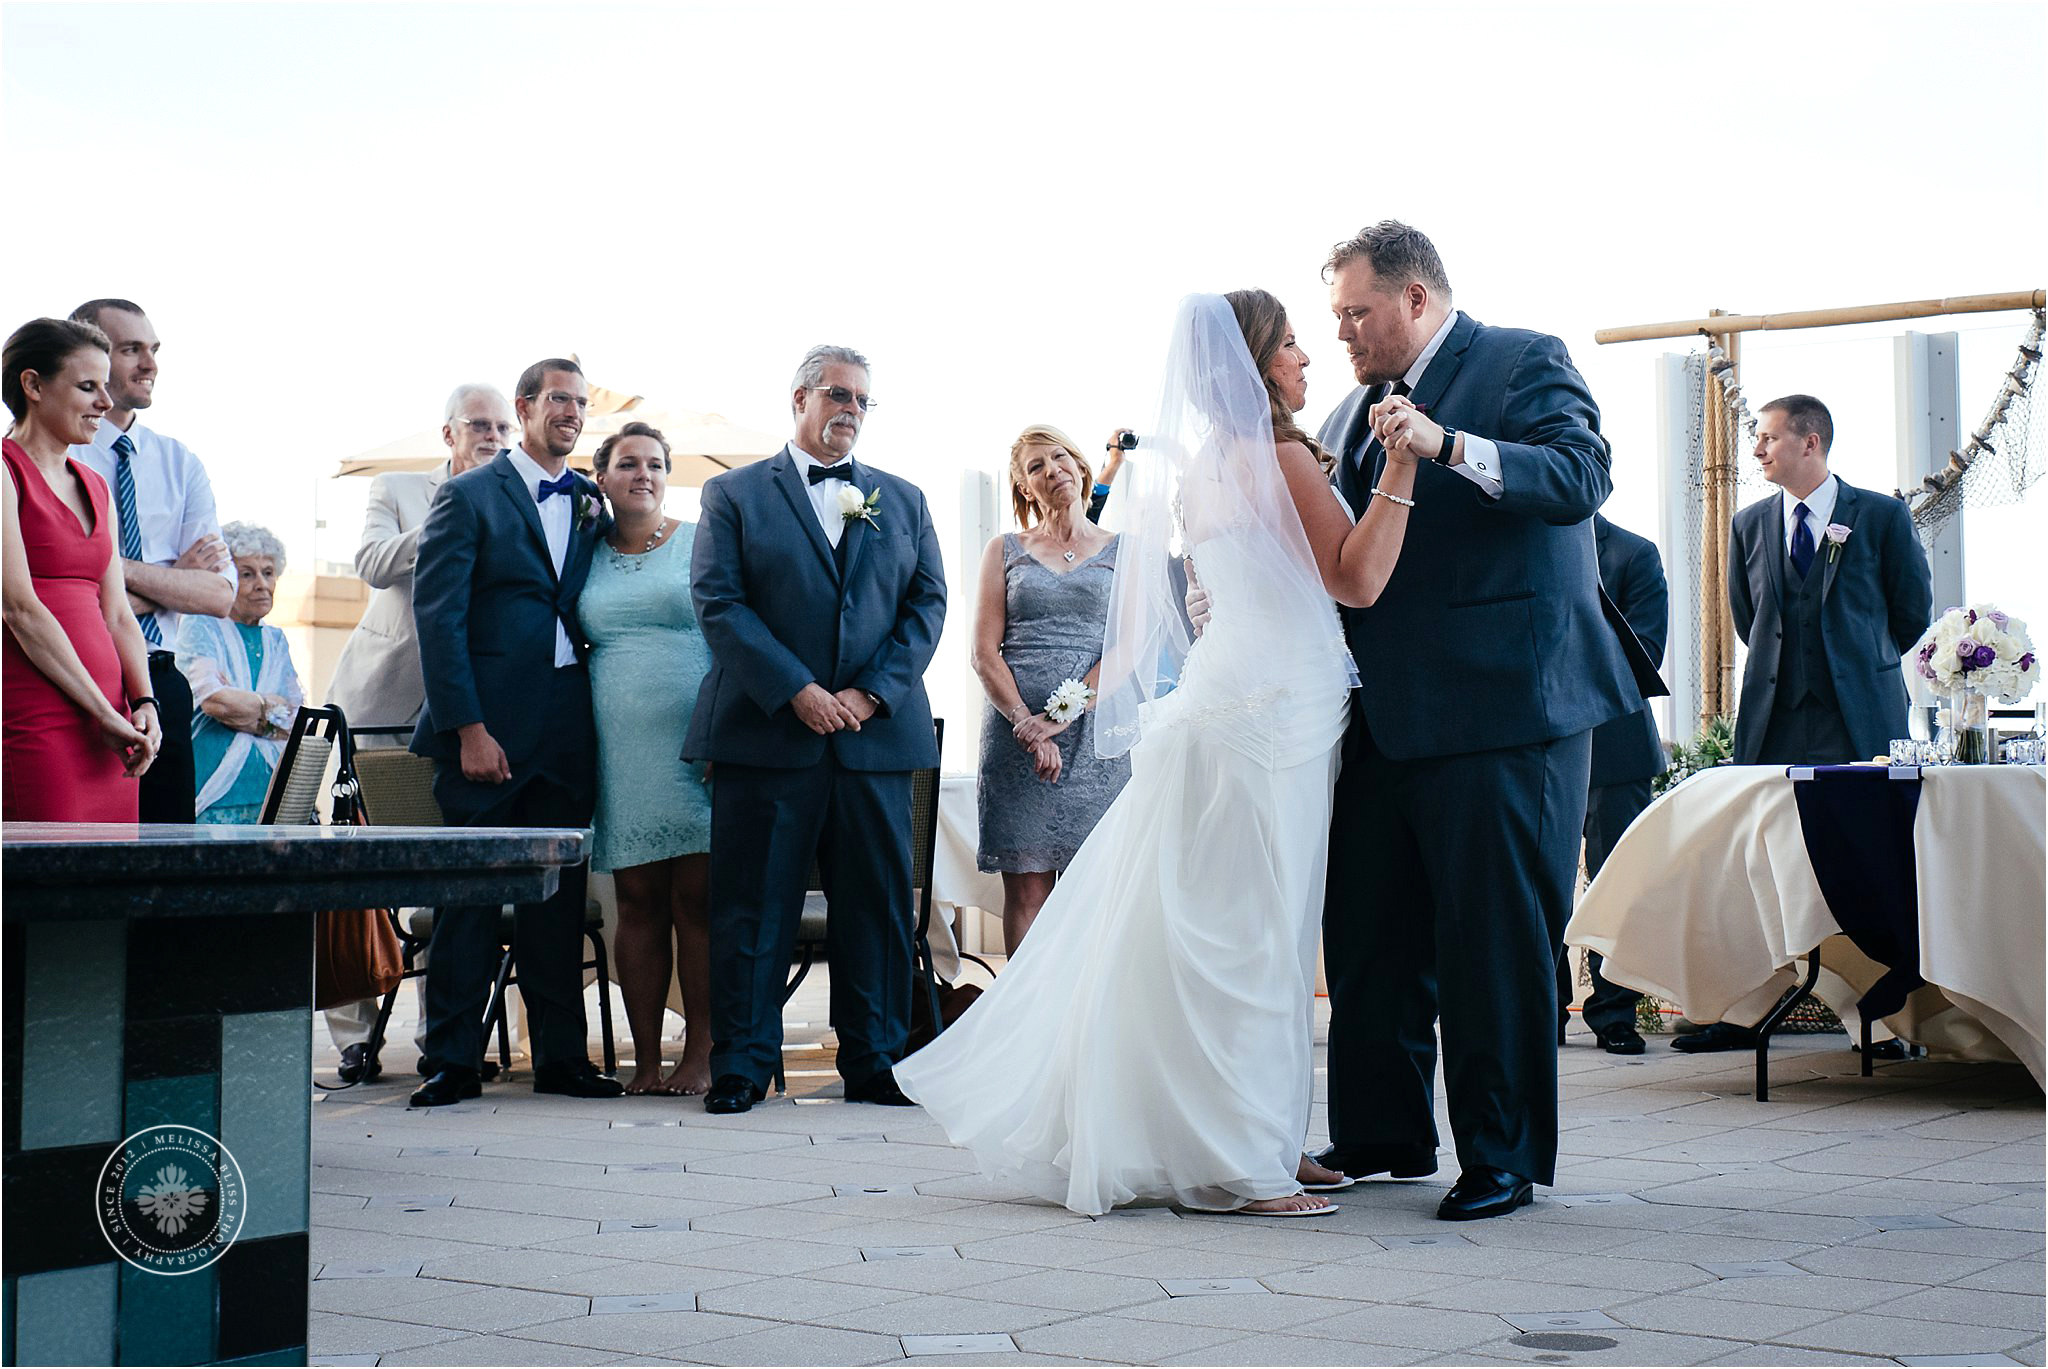 virginia-beach-wedding-photographer-oceanaire-resort-wedding-va-beach-norfolk-portsmouth-chesapeake-wedding-photographers-melissa-bliss-photography